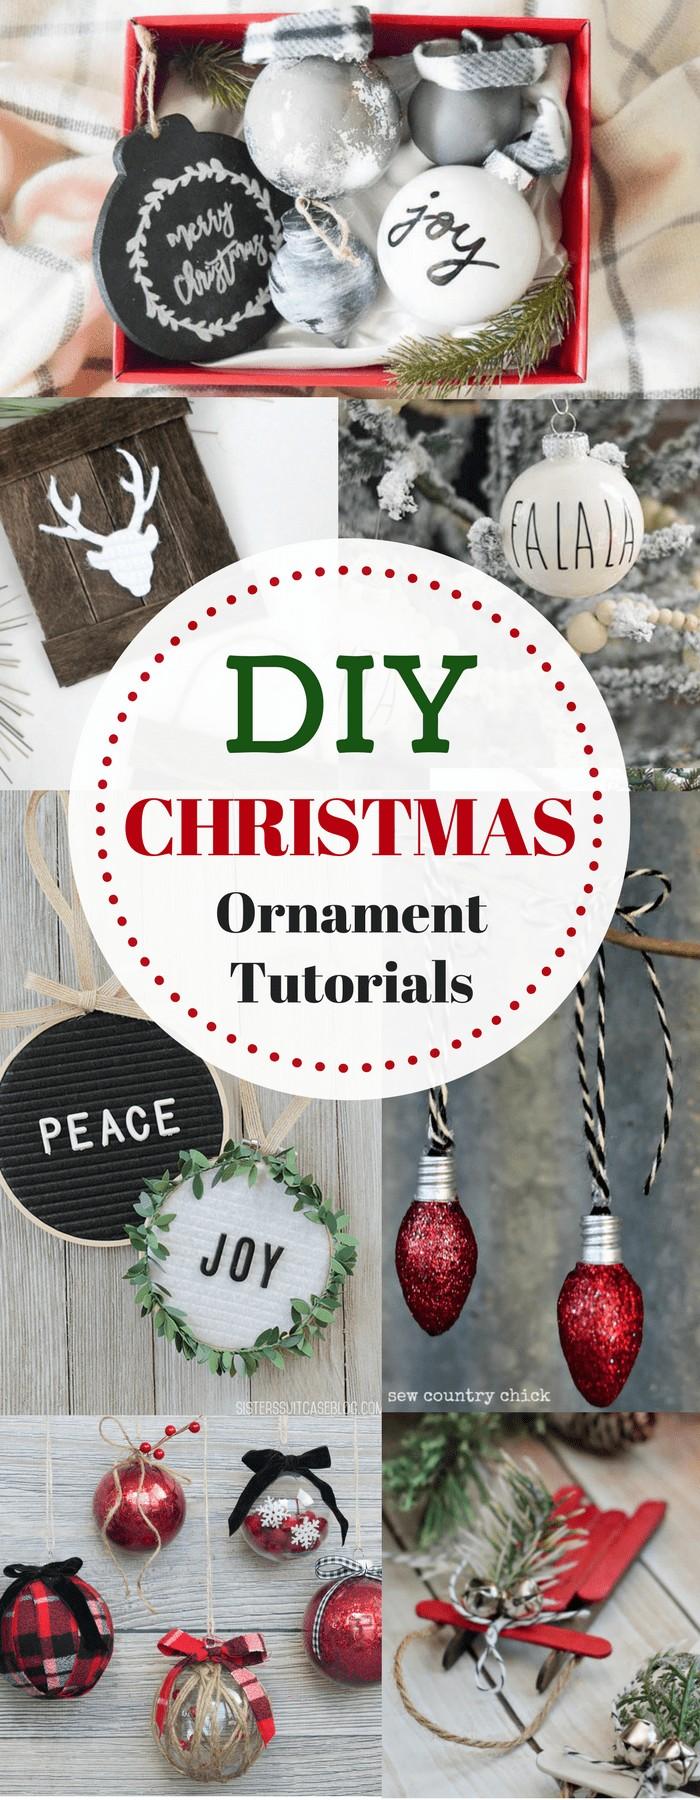 Rustic Farmhouse Christmas Ornament DIY Tutorials